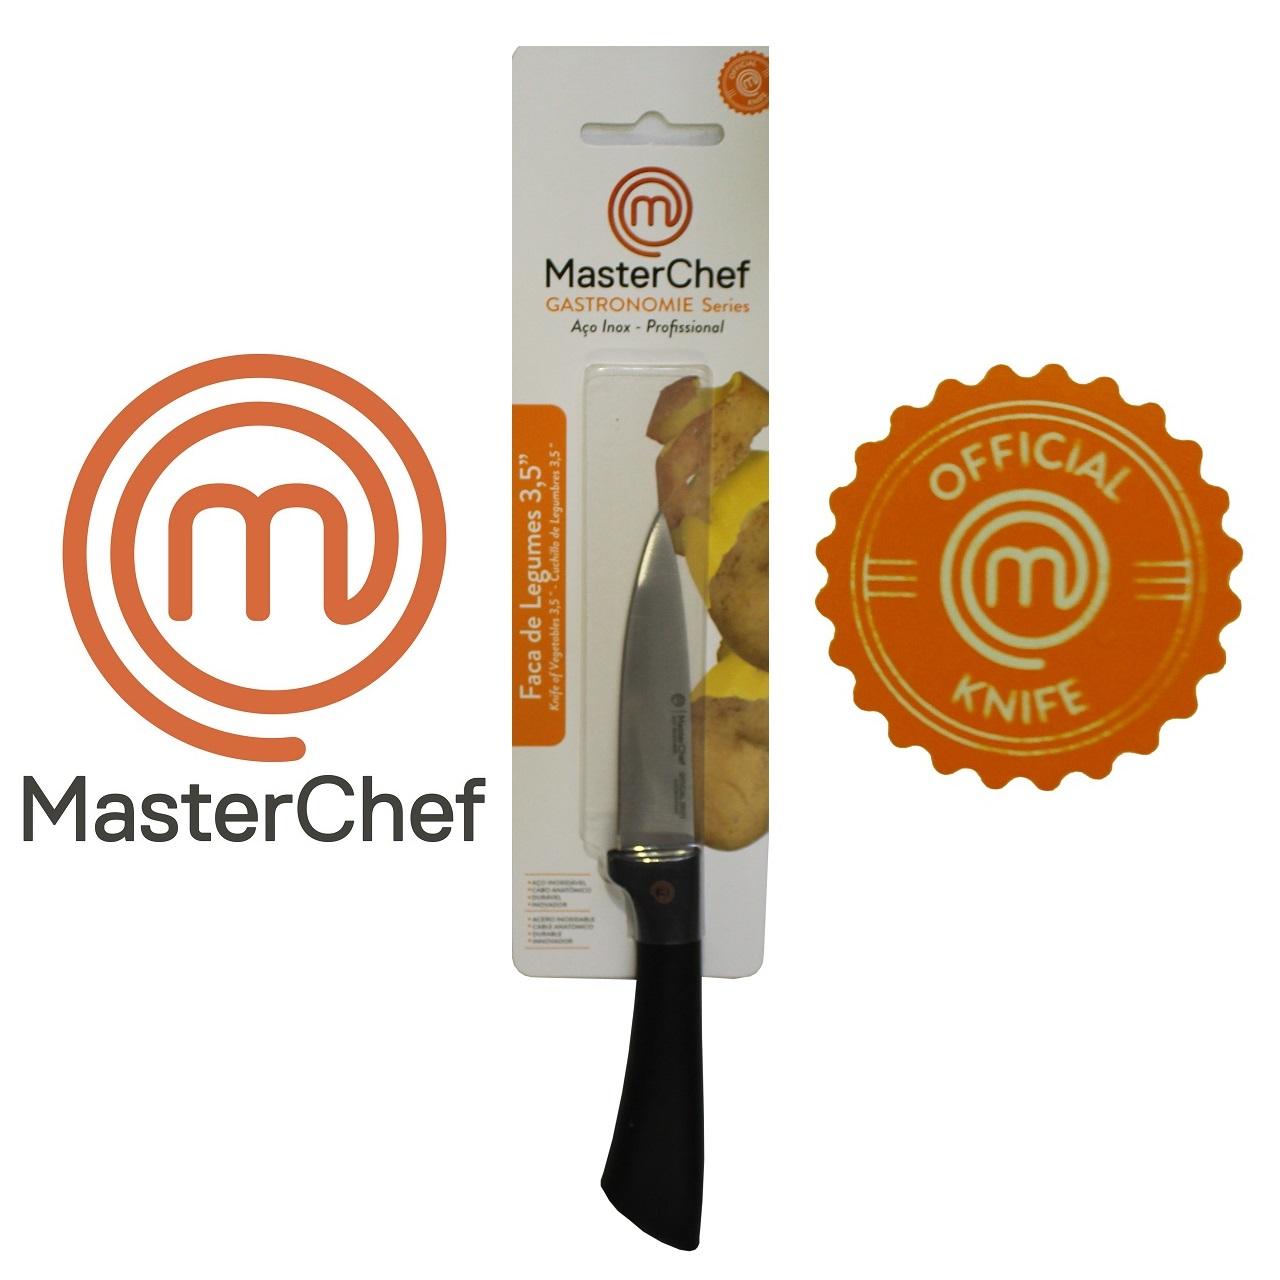 Kit 4 Facas Gastronomie MasterChef